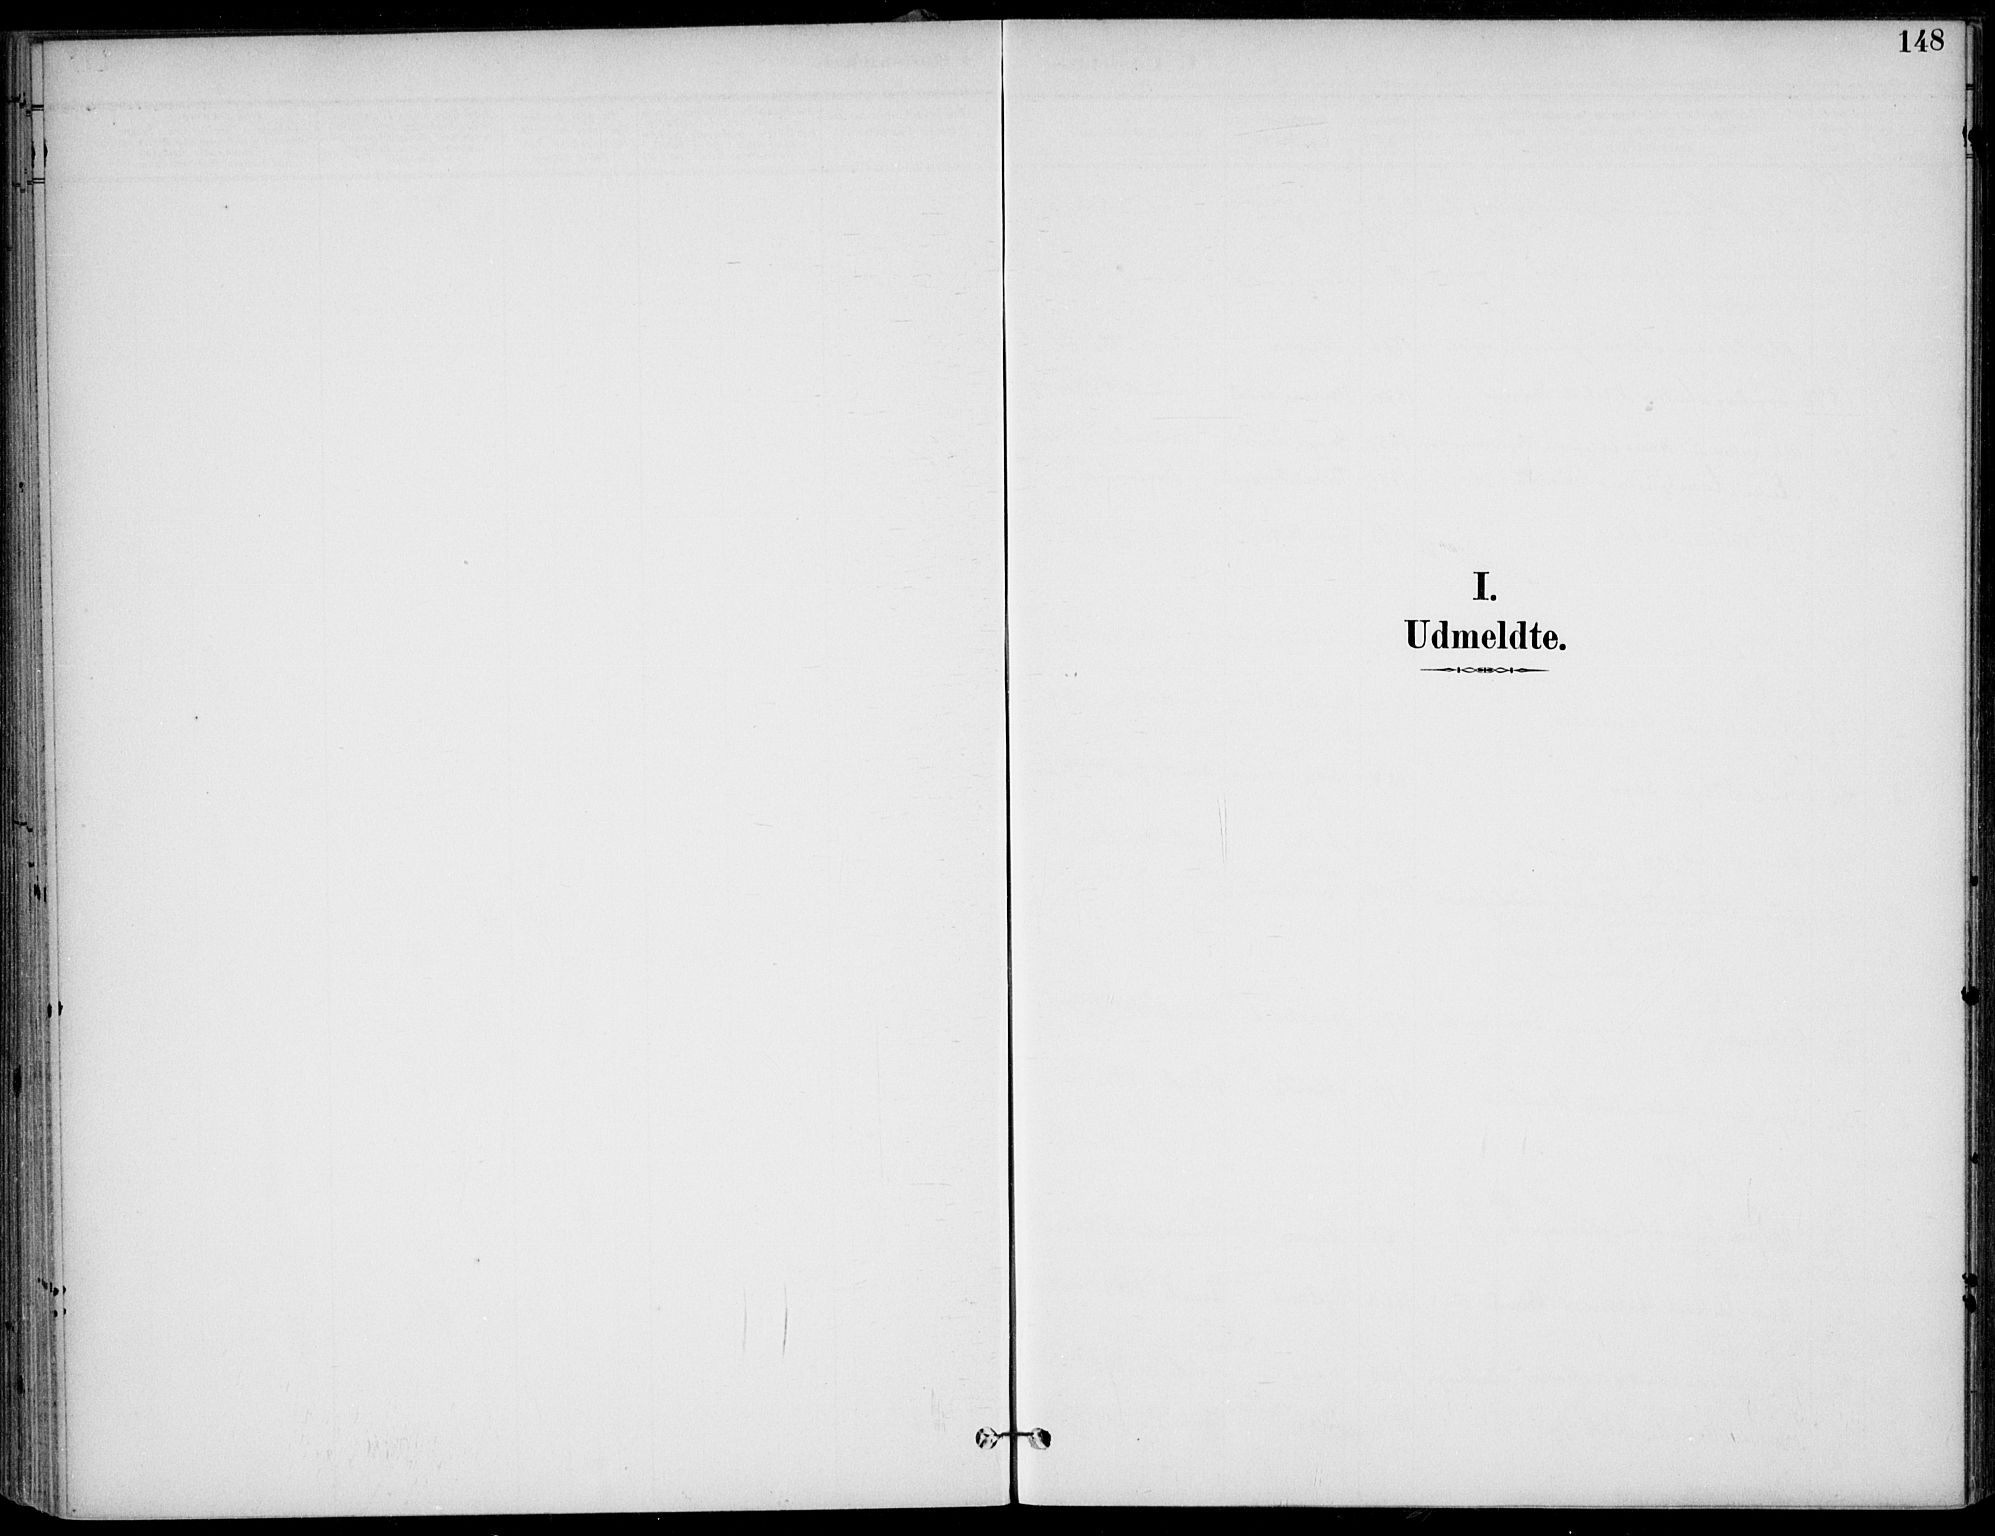 SAKO, Lunde kirkebøker, F/Fa/L0003: Ministerialbok nr. I 3, 1893-1902, s. 148